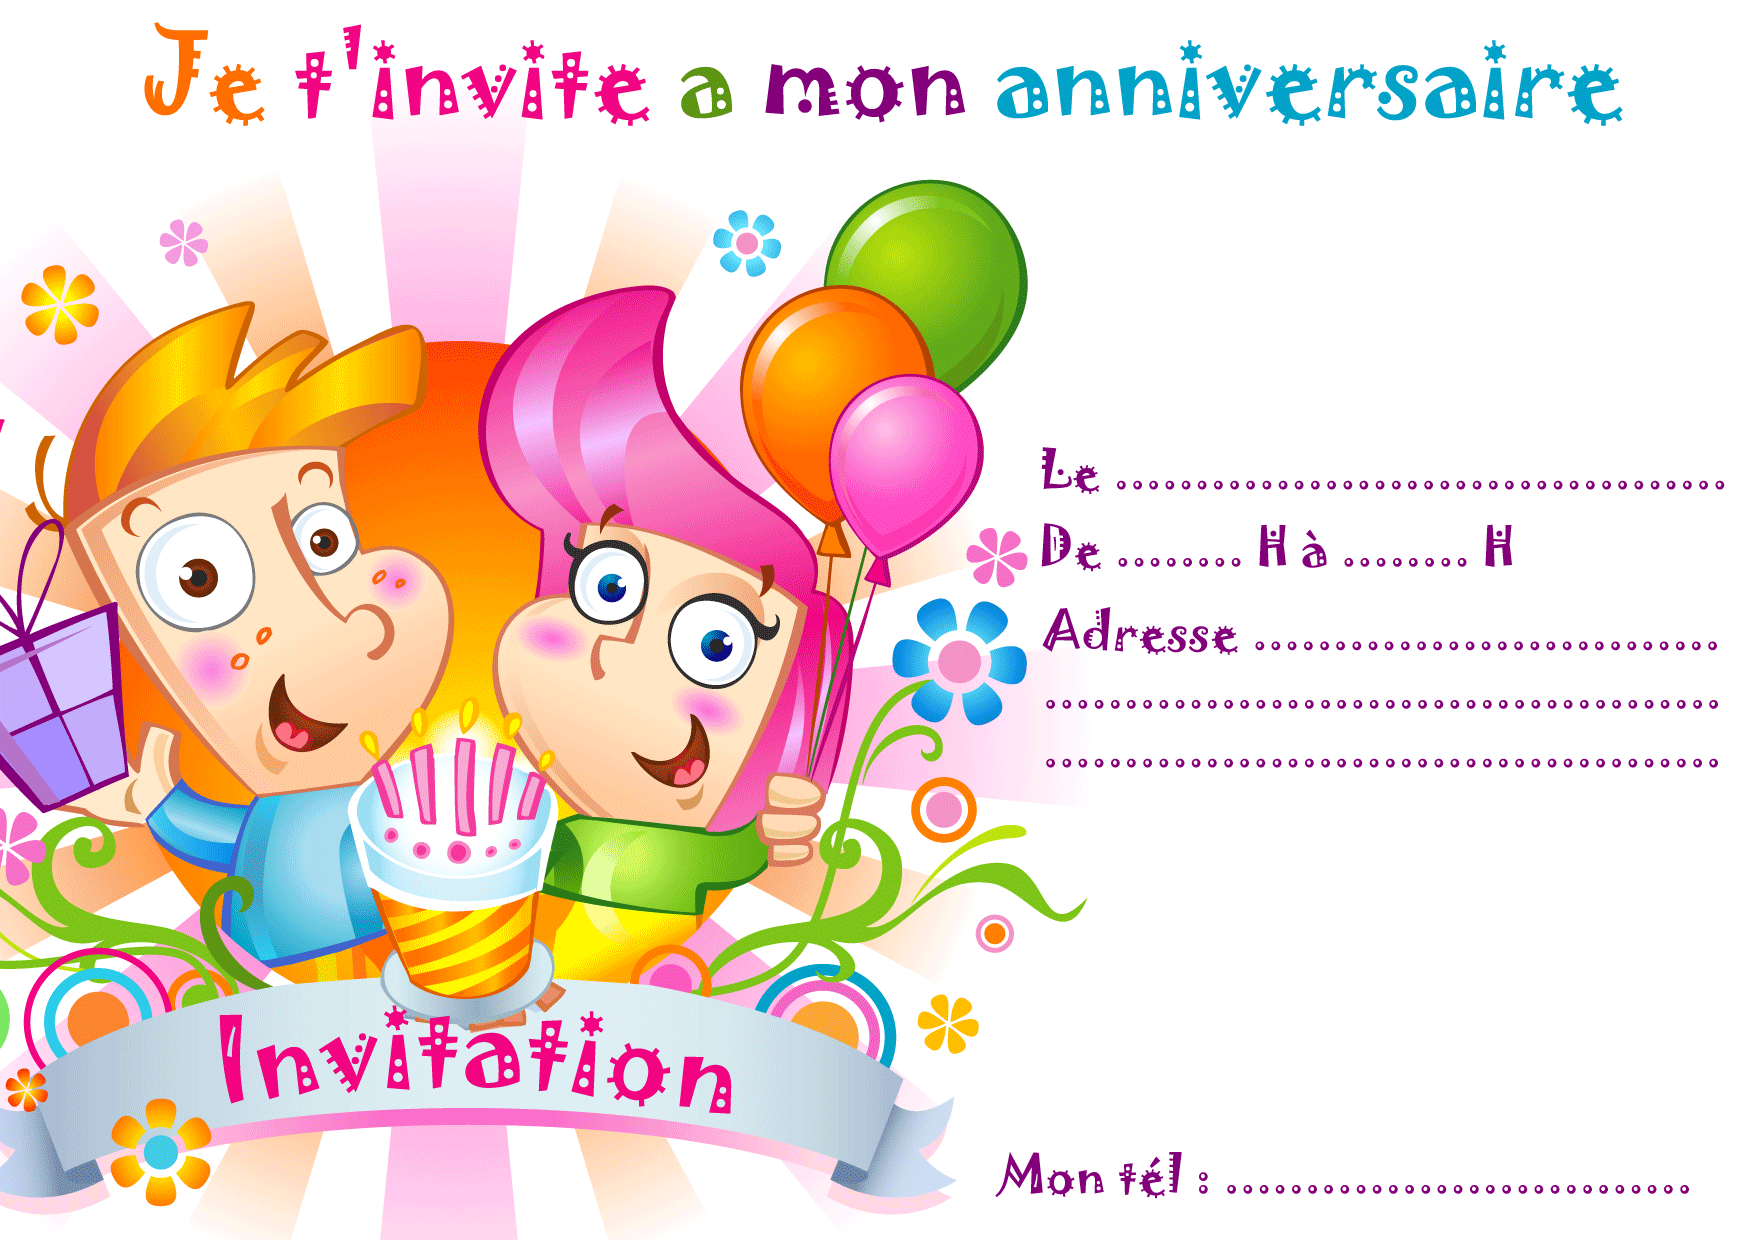 Invitation Gratuite Anniversaire Gar On